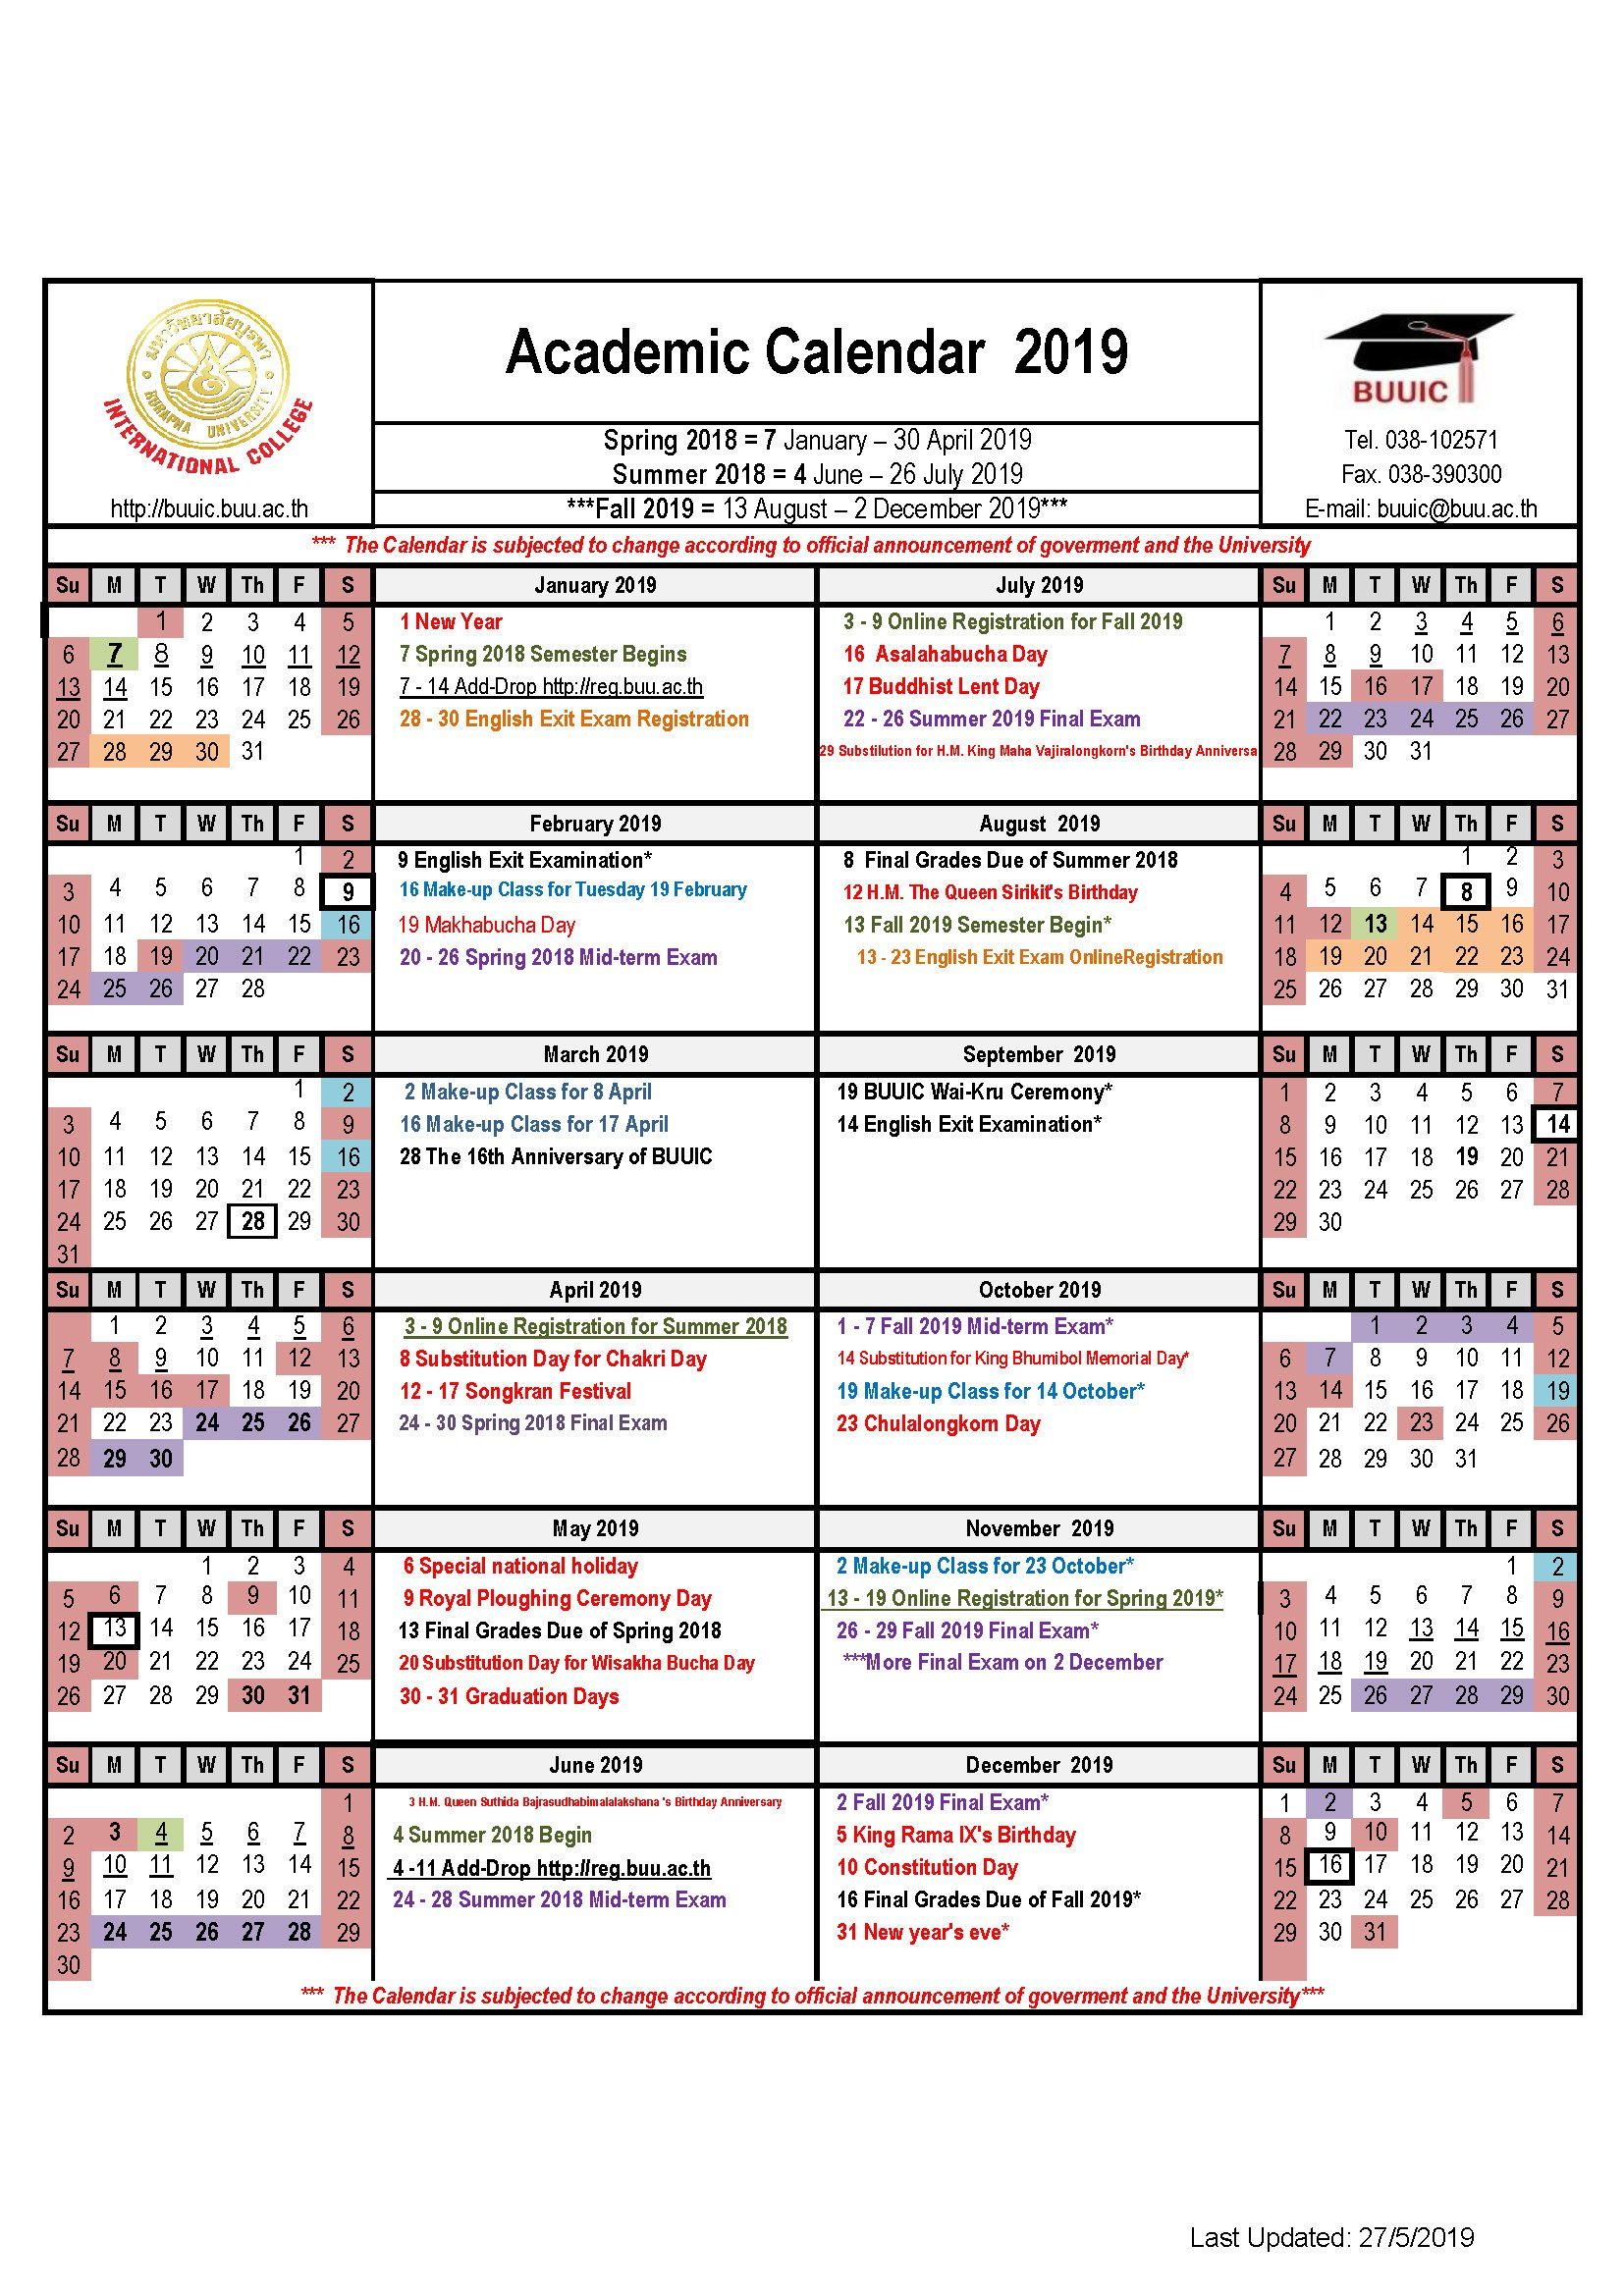 Academic Calendar 2019 - Buuic U Of M Calendar 2019